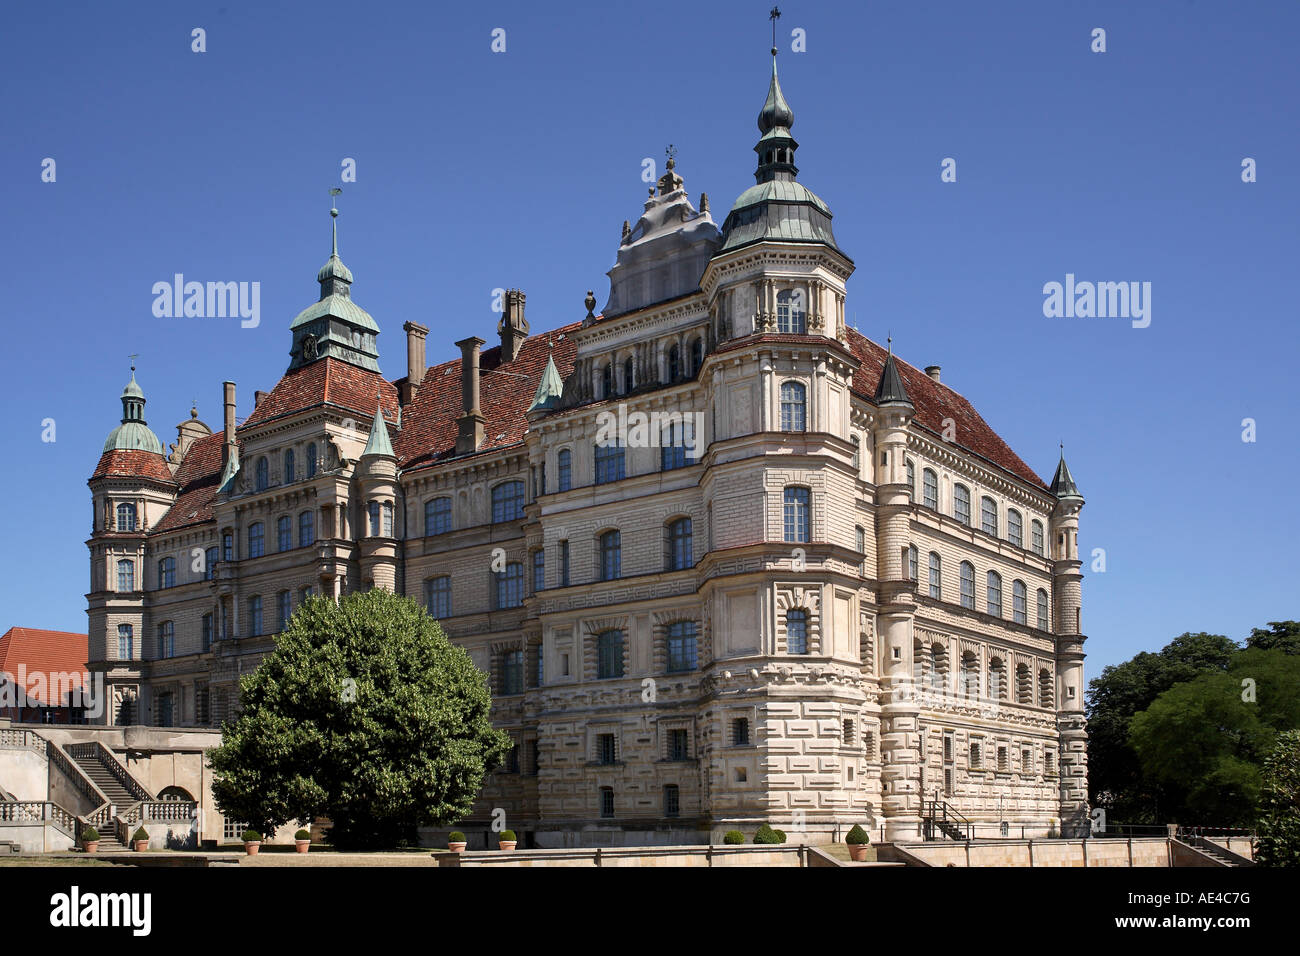 The Castle of Schwerin, state capitol of Mecklenburg-Vorpommern ...